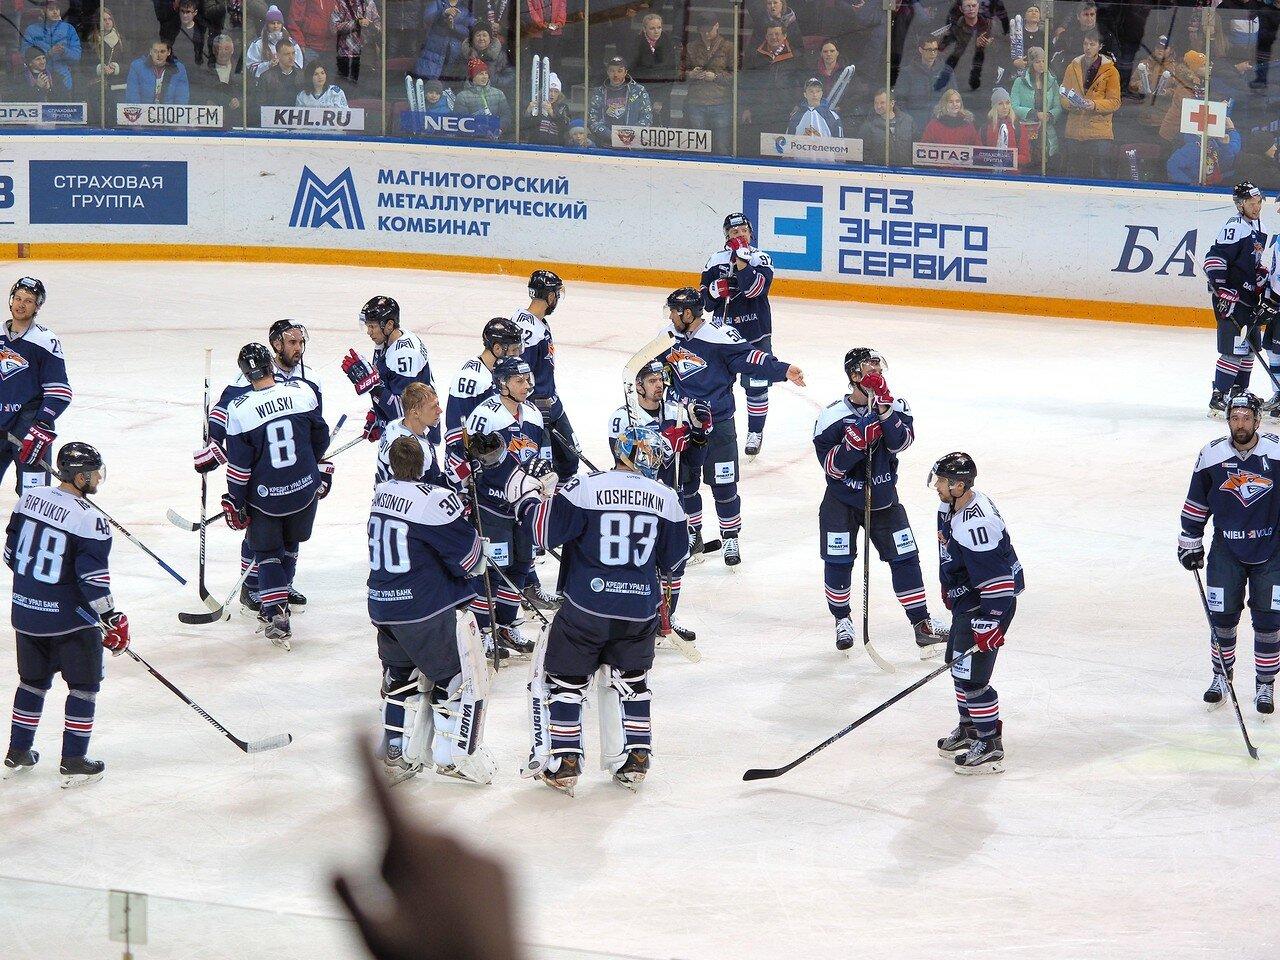 93Плей-офф 2016 Восток 1/2 Металлург - Сибирь 16.03.2016